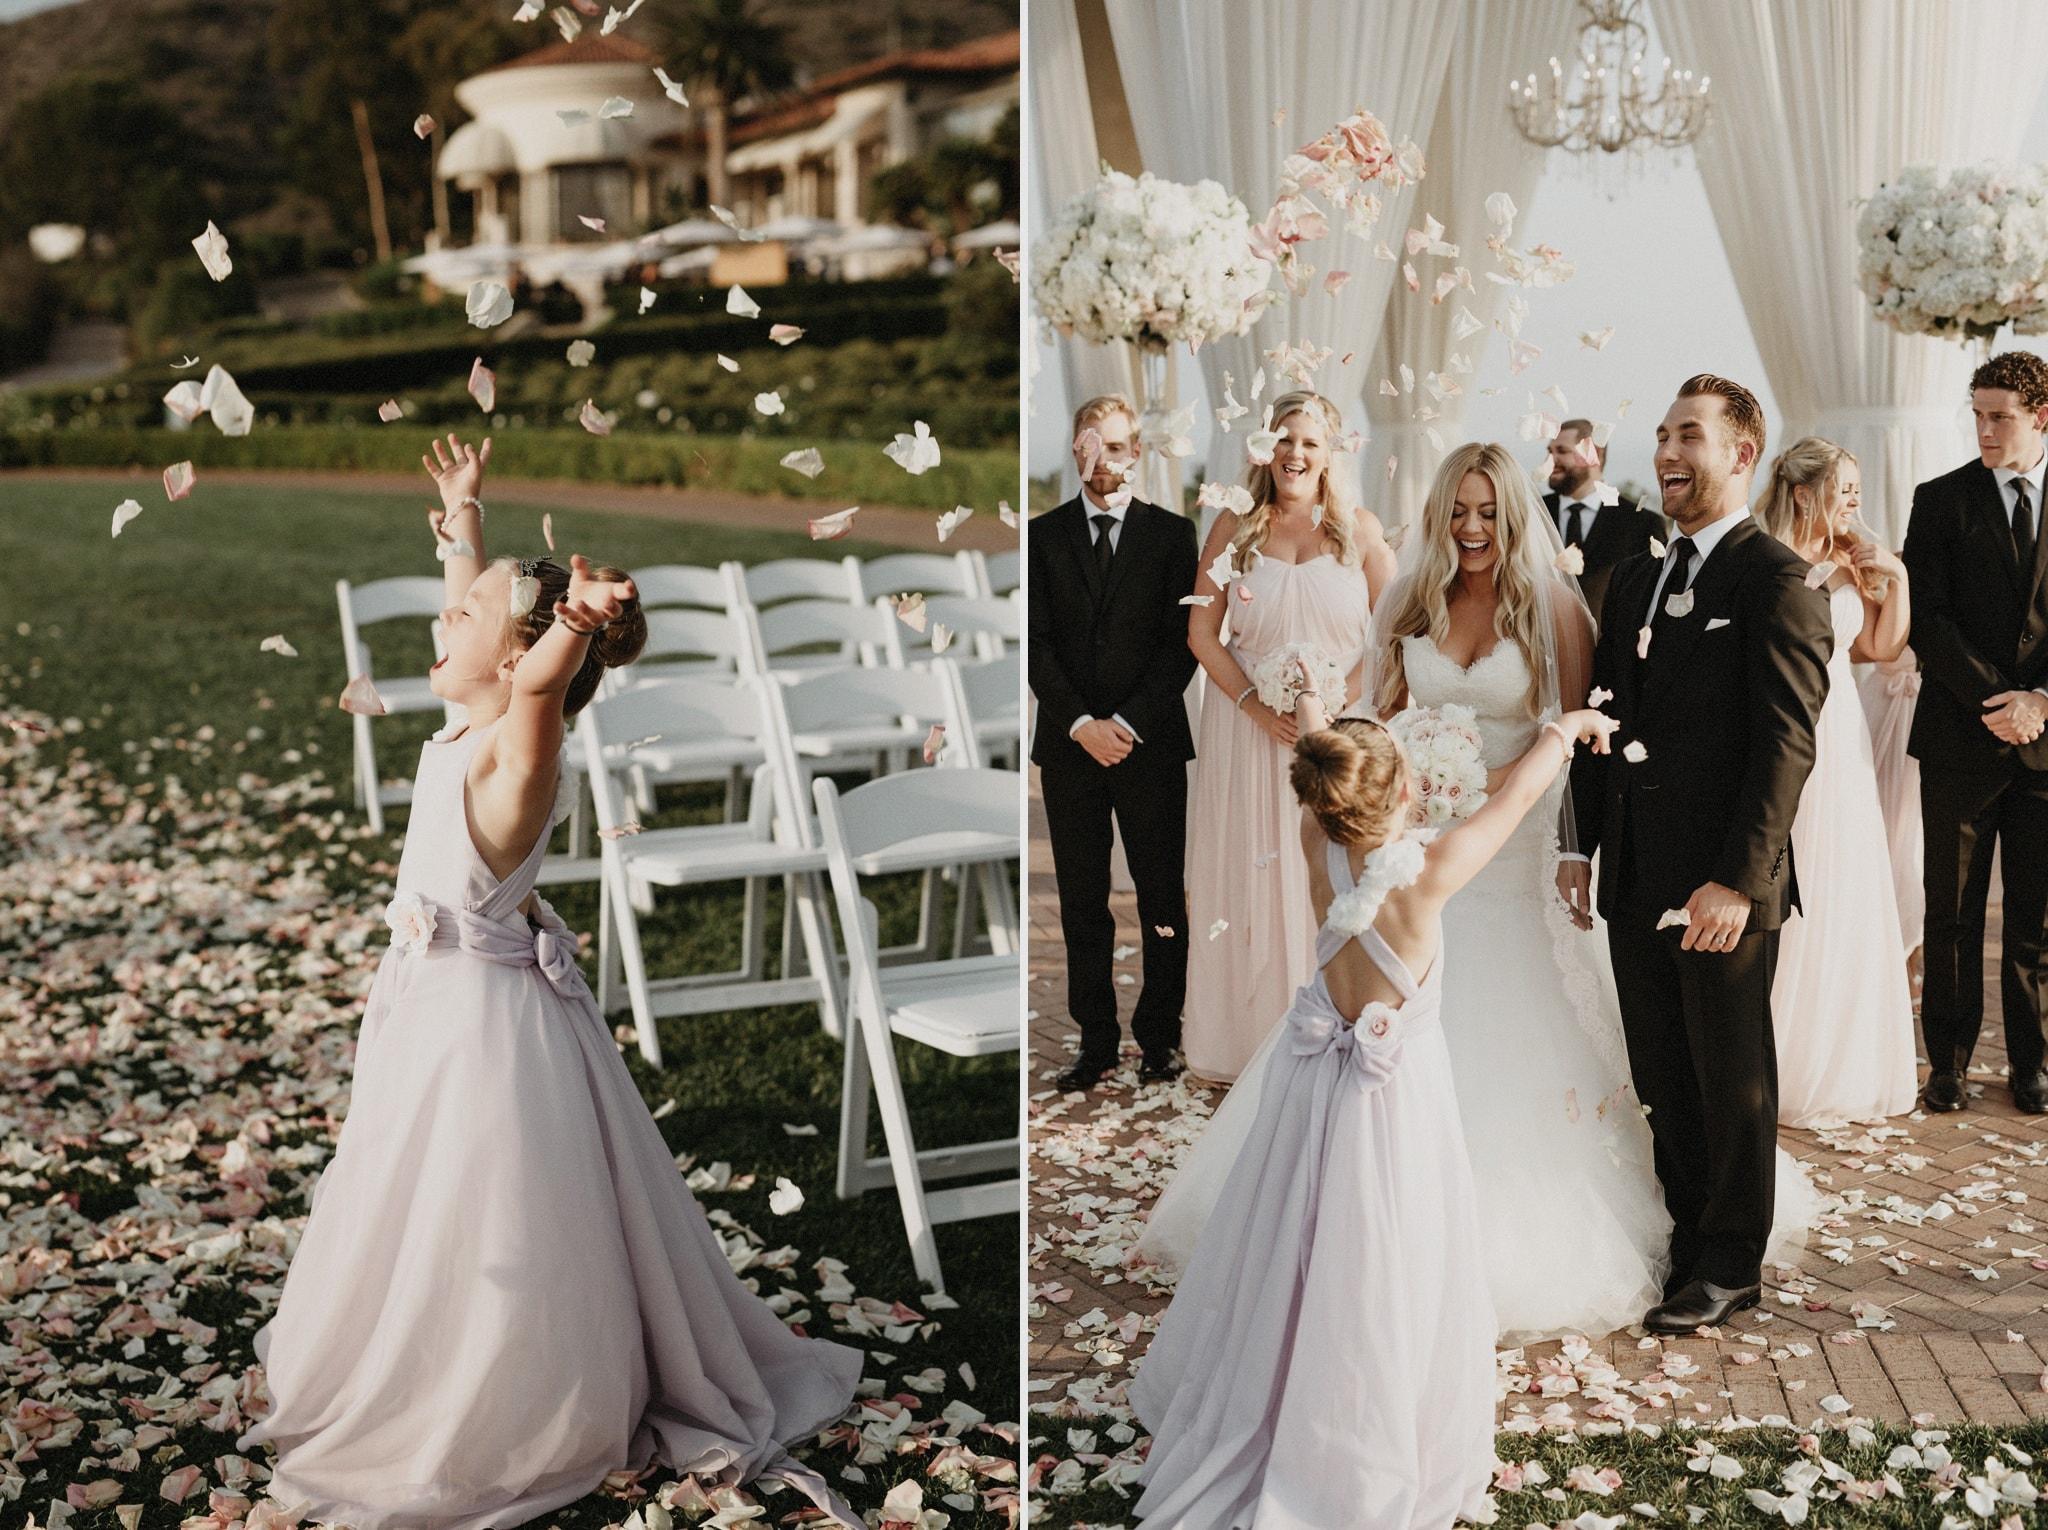 056-california-destination-wedding.jpg